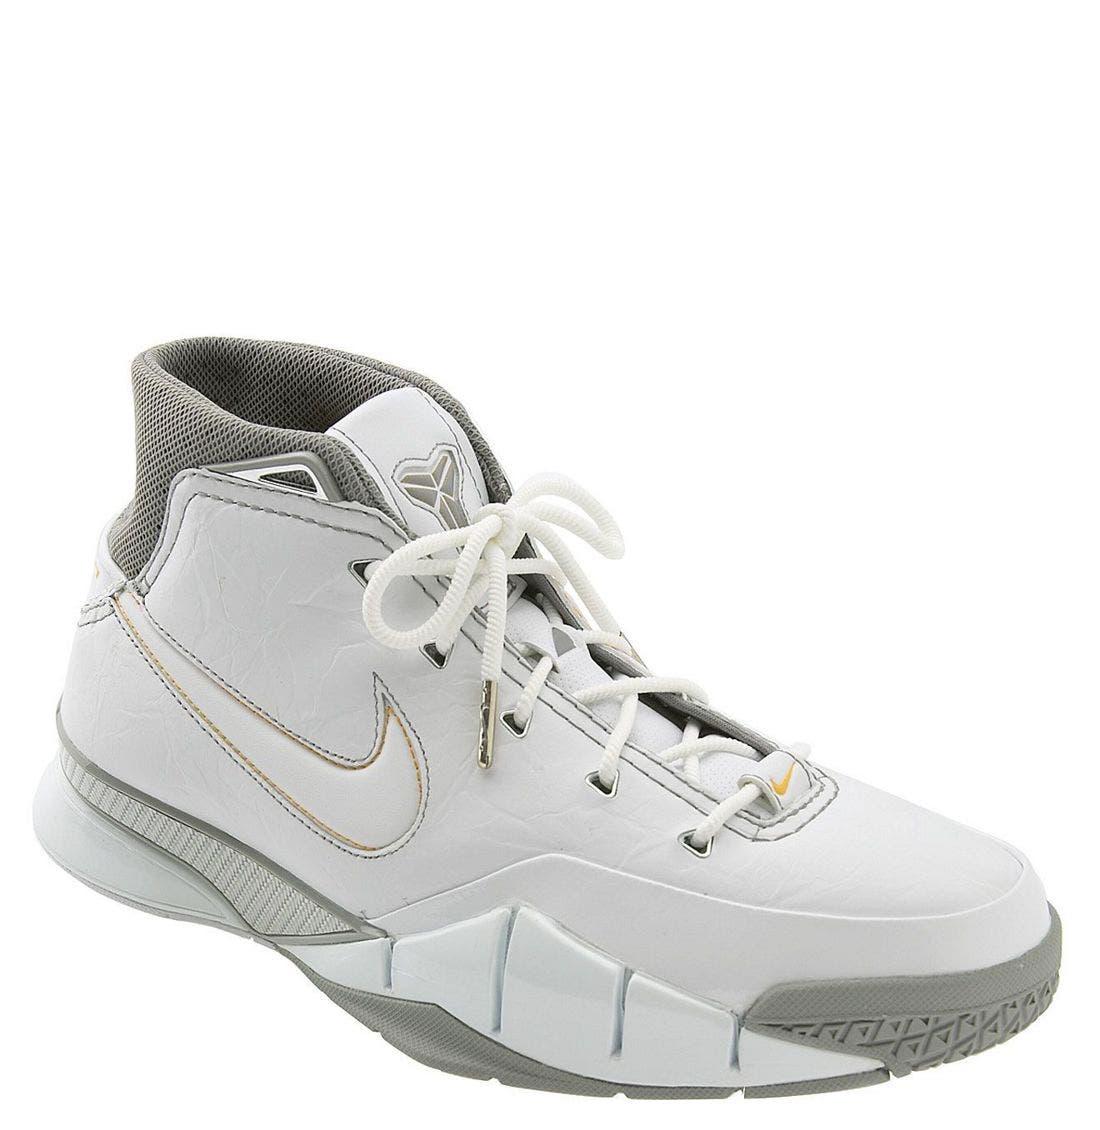 Main Image - Nike 'Air Zoom Kobe I' Basketball Shoe (Men)